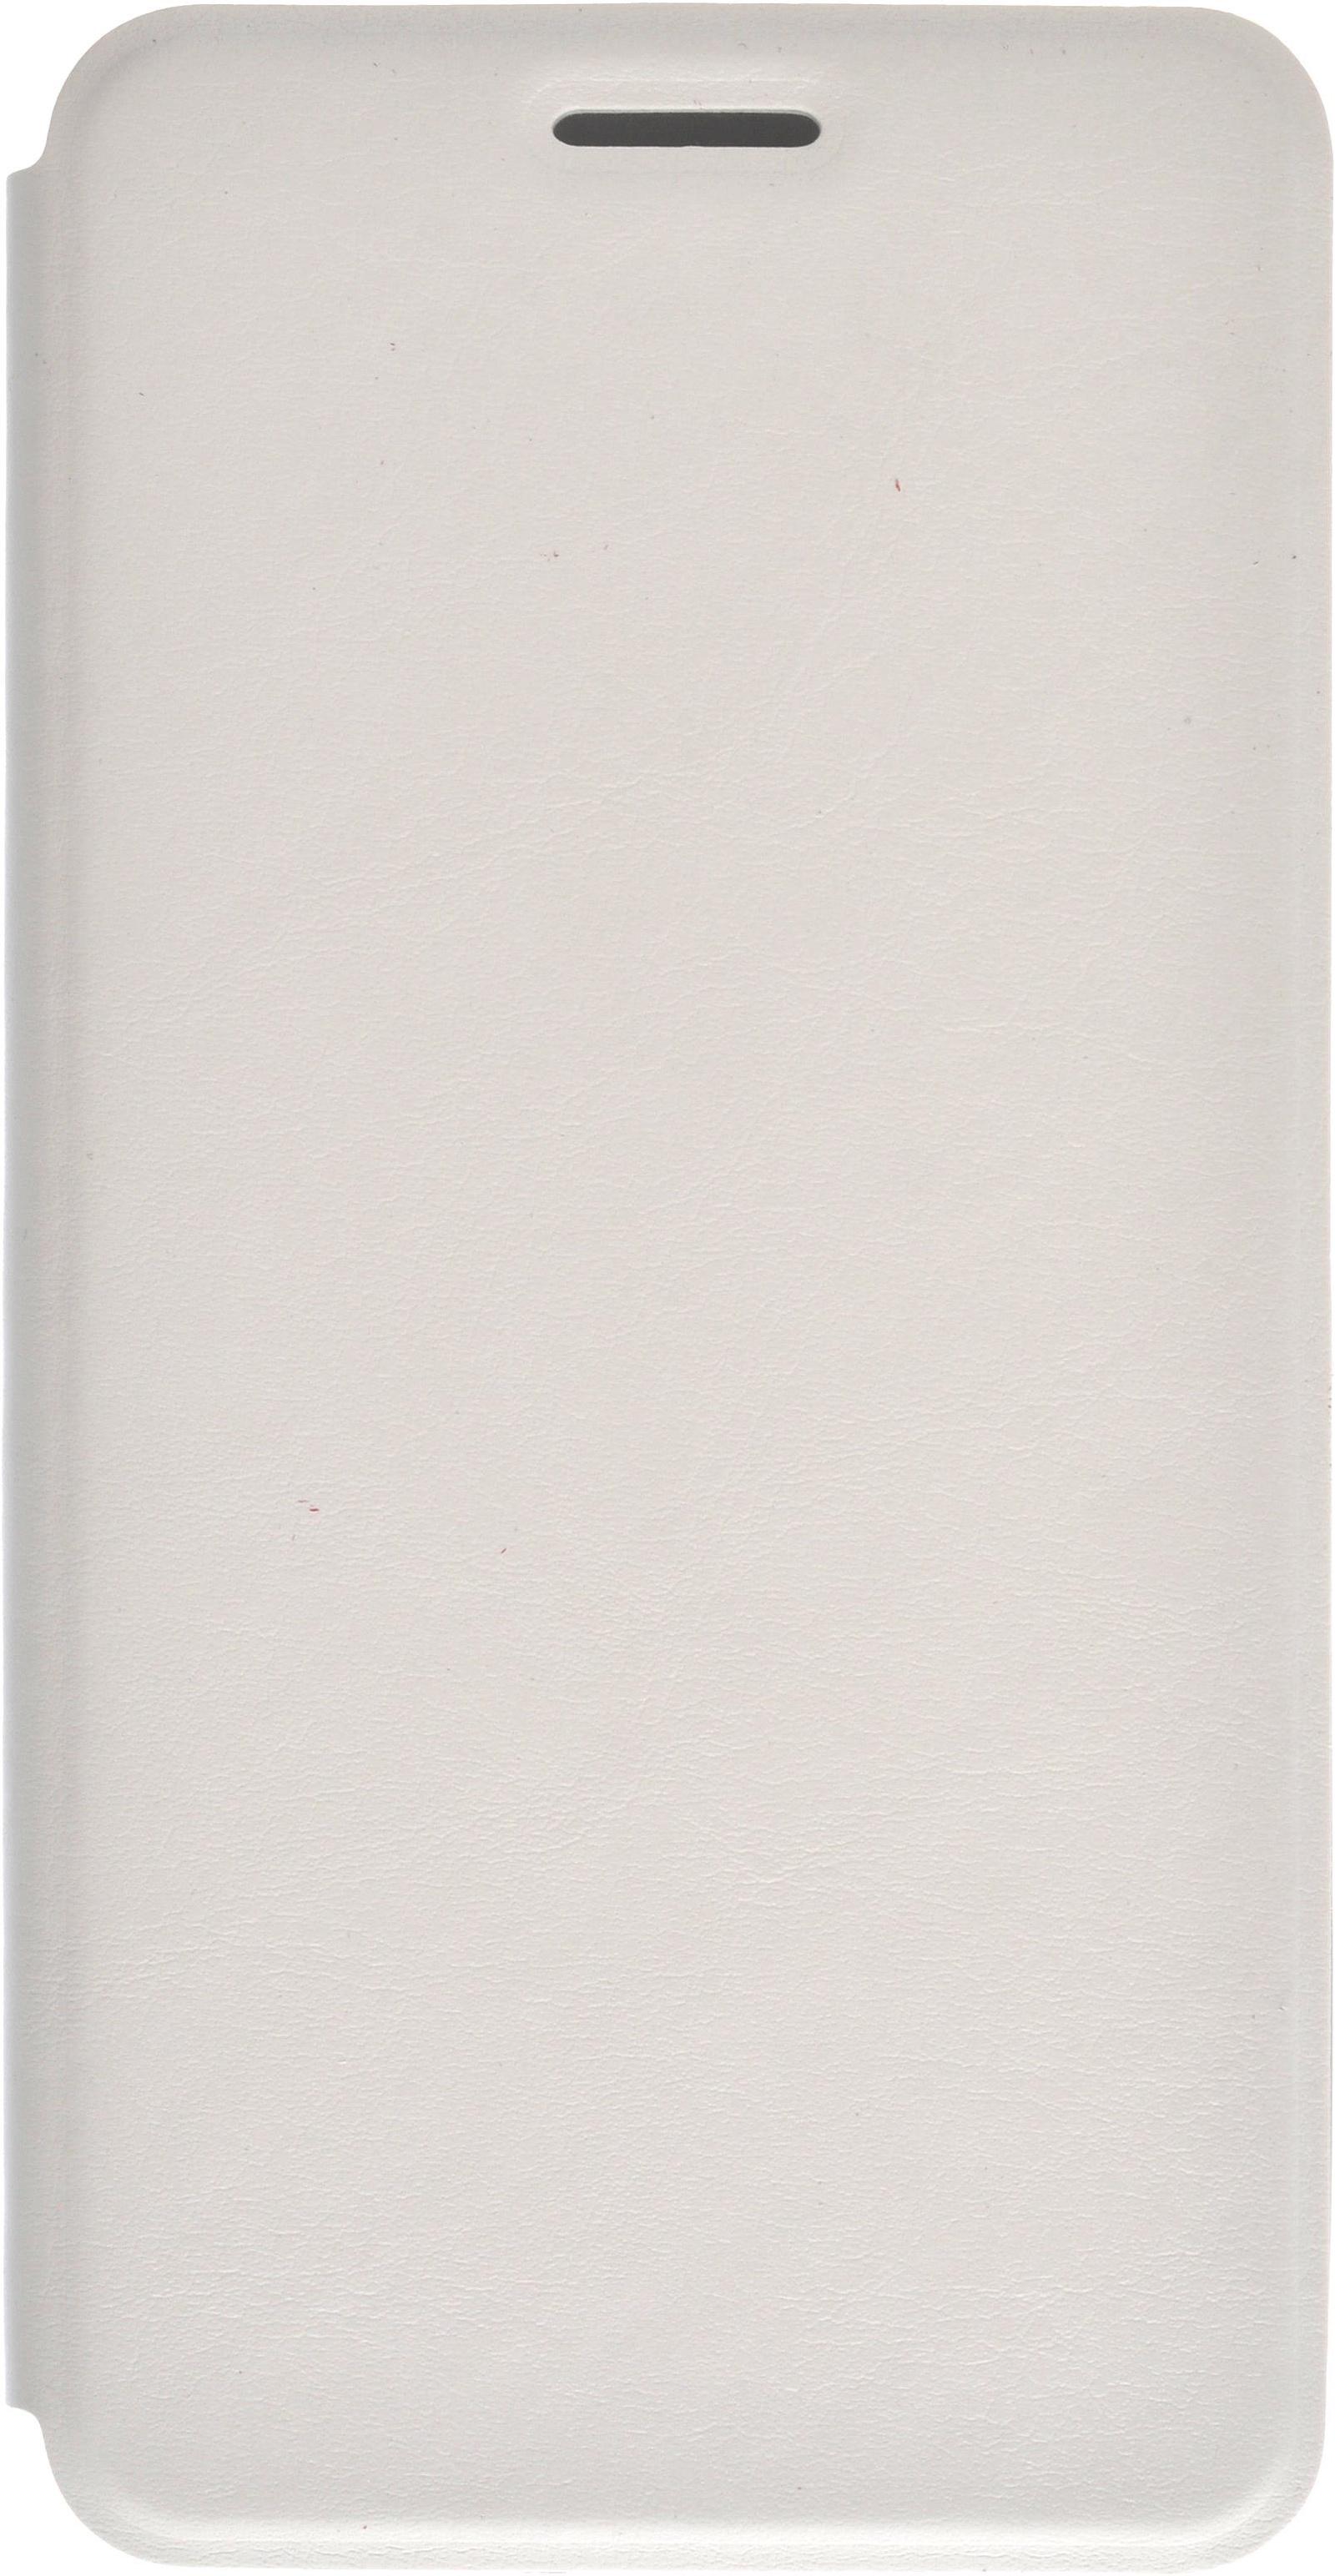 Чехол для сотового телефона skinBOX Lux, 4630042527294, белый nokia cc 3096 чехол для lumia 435 532 bright green